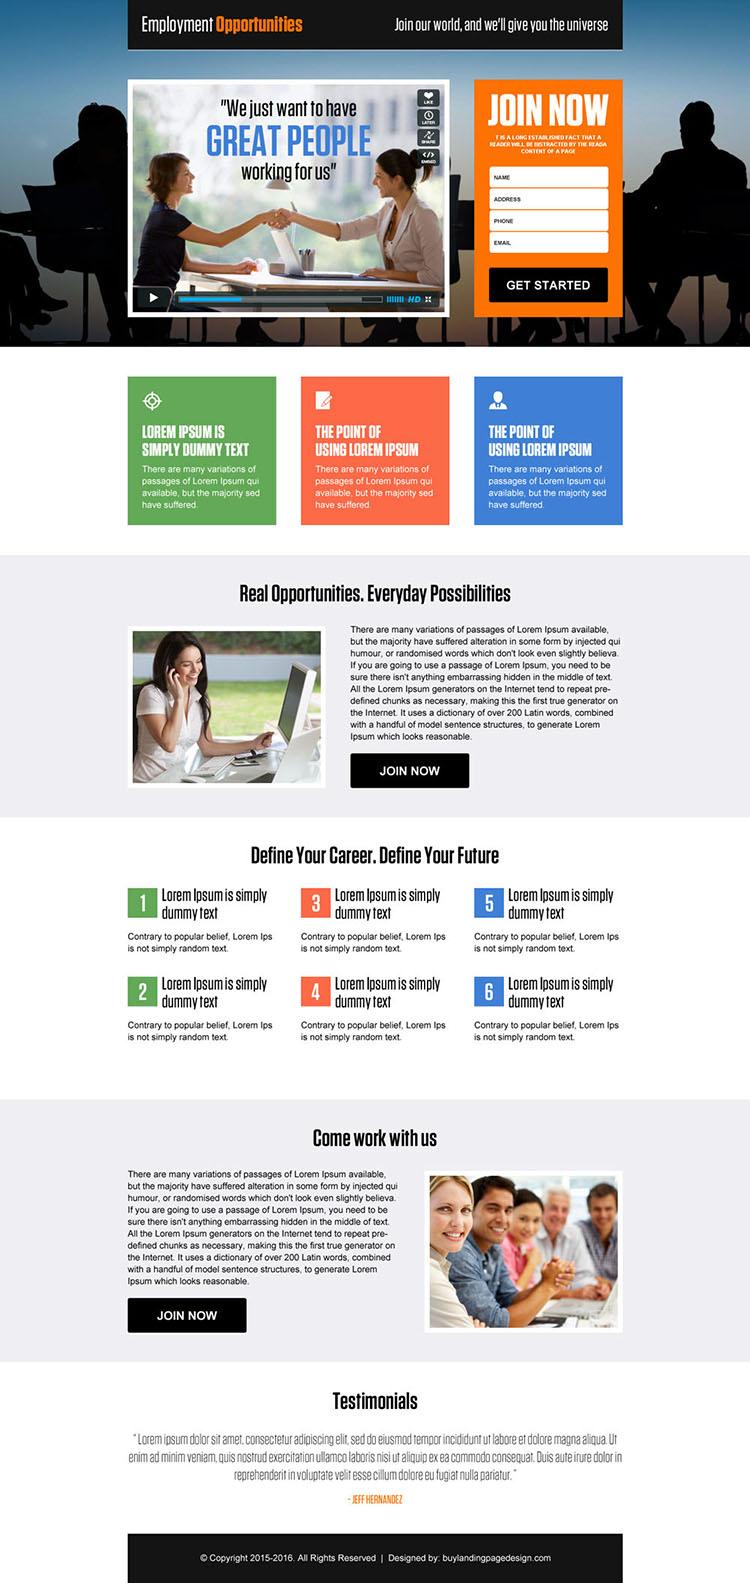 employment opportunities video responsive lead capture landing page design